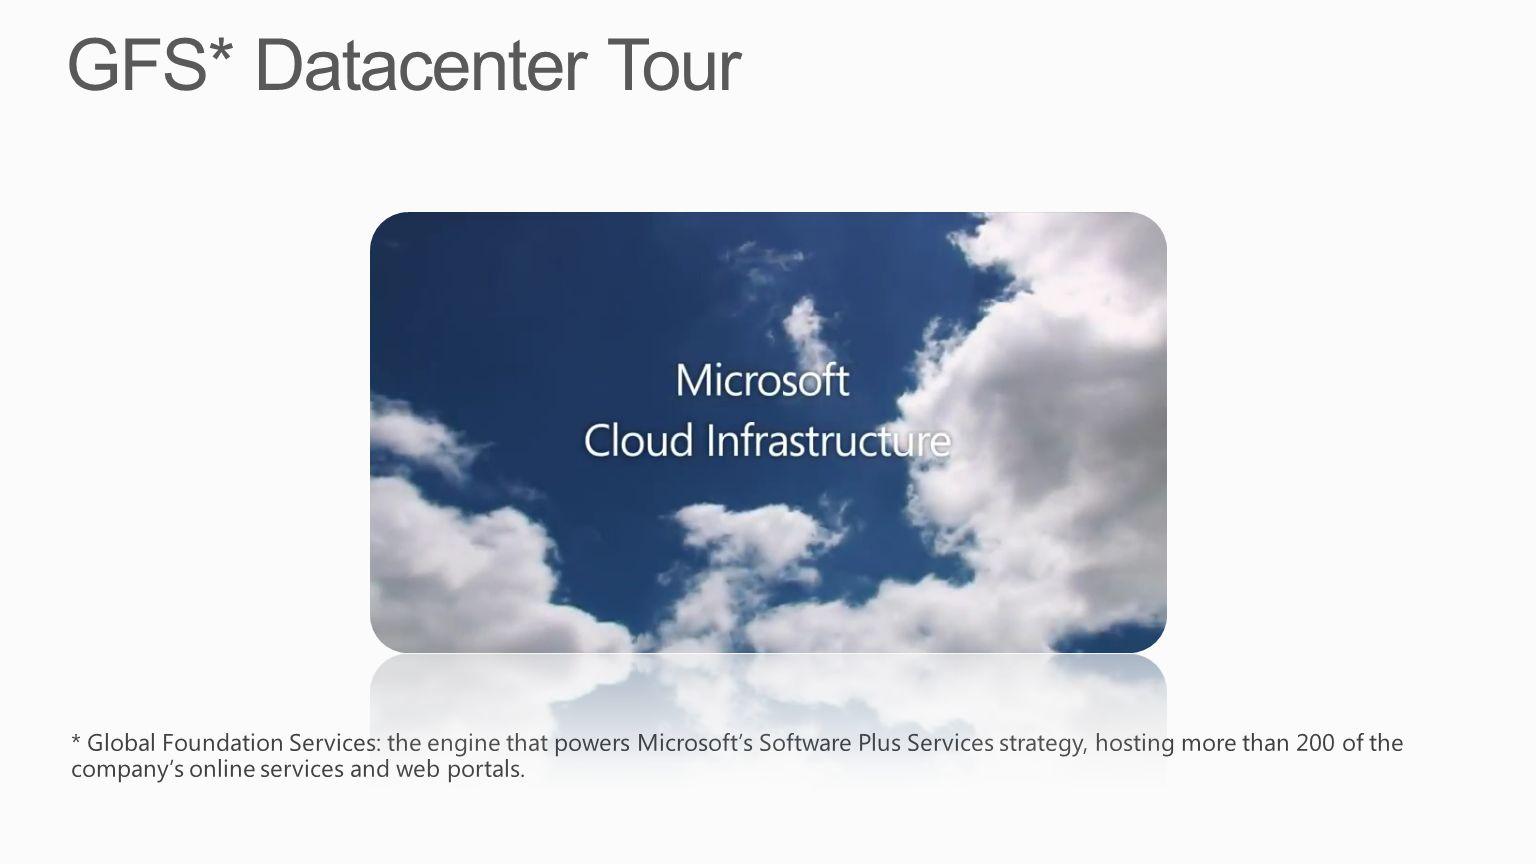 GFS* Datacenter Tour